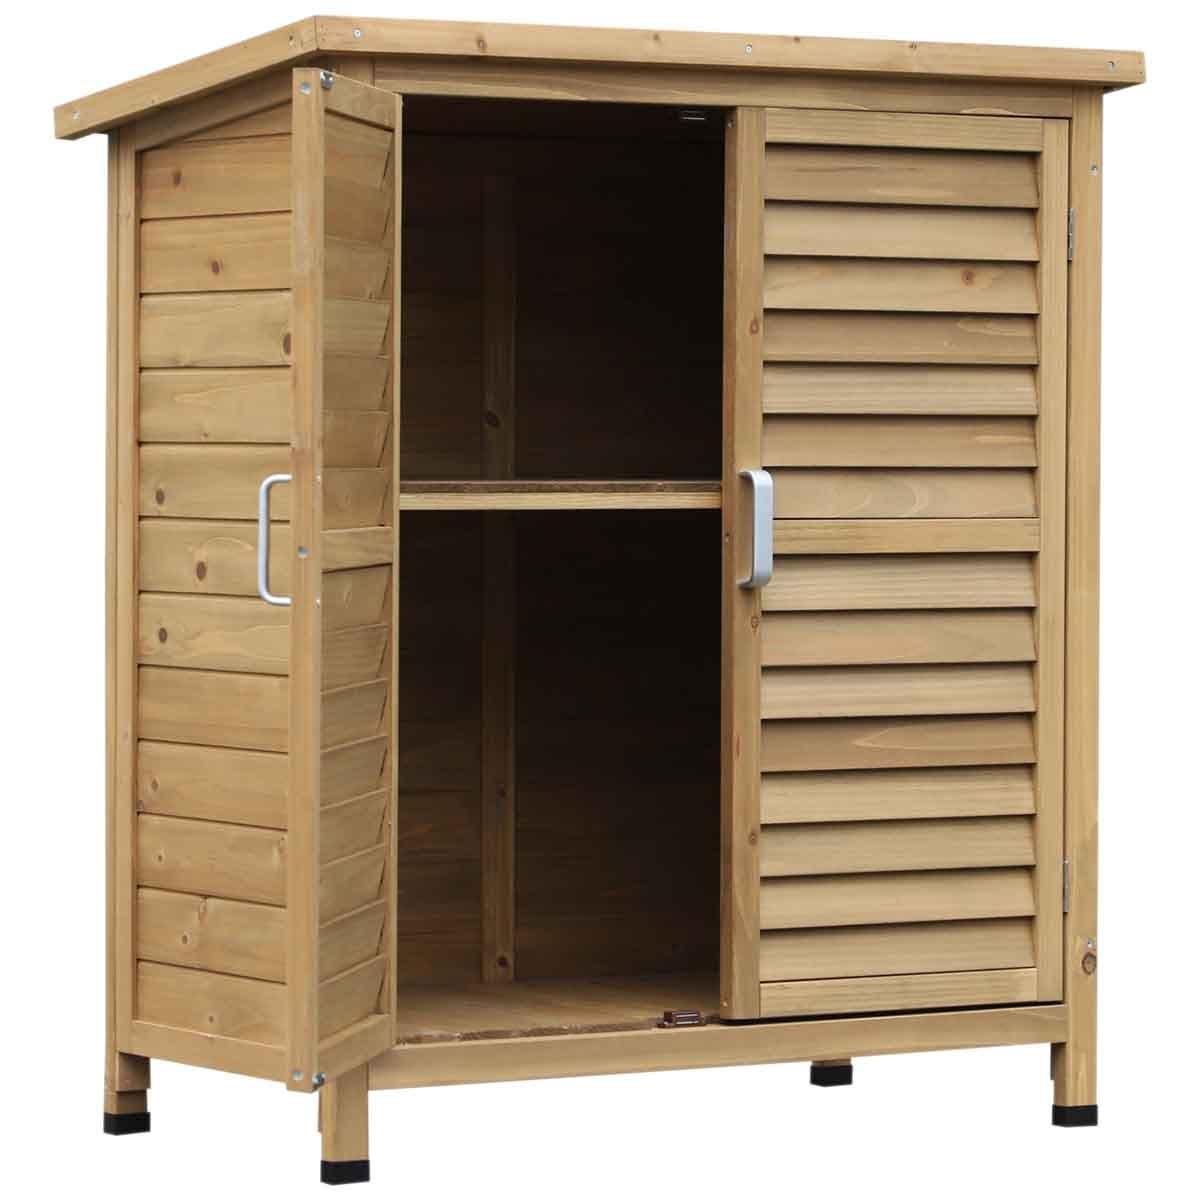 Outsunny Wooden Garden Storage Unit